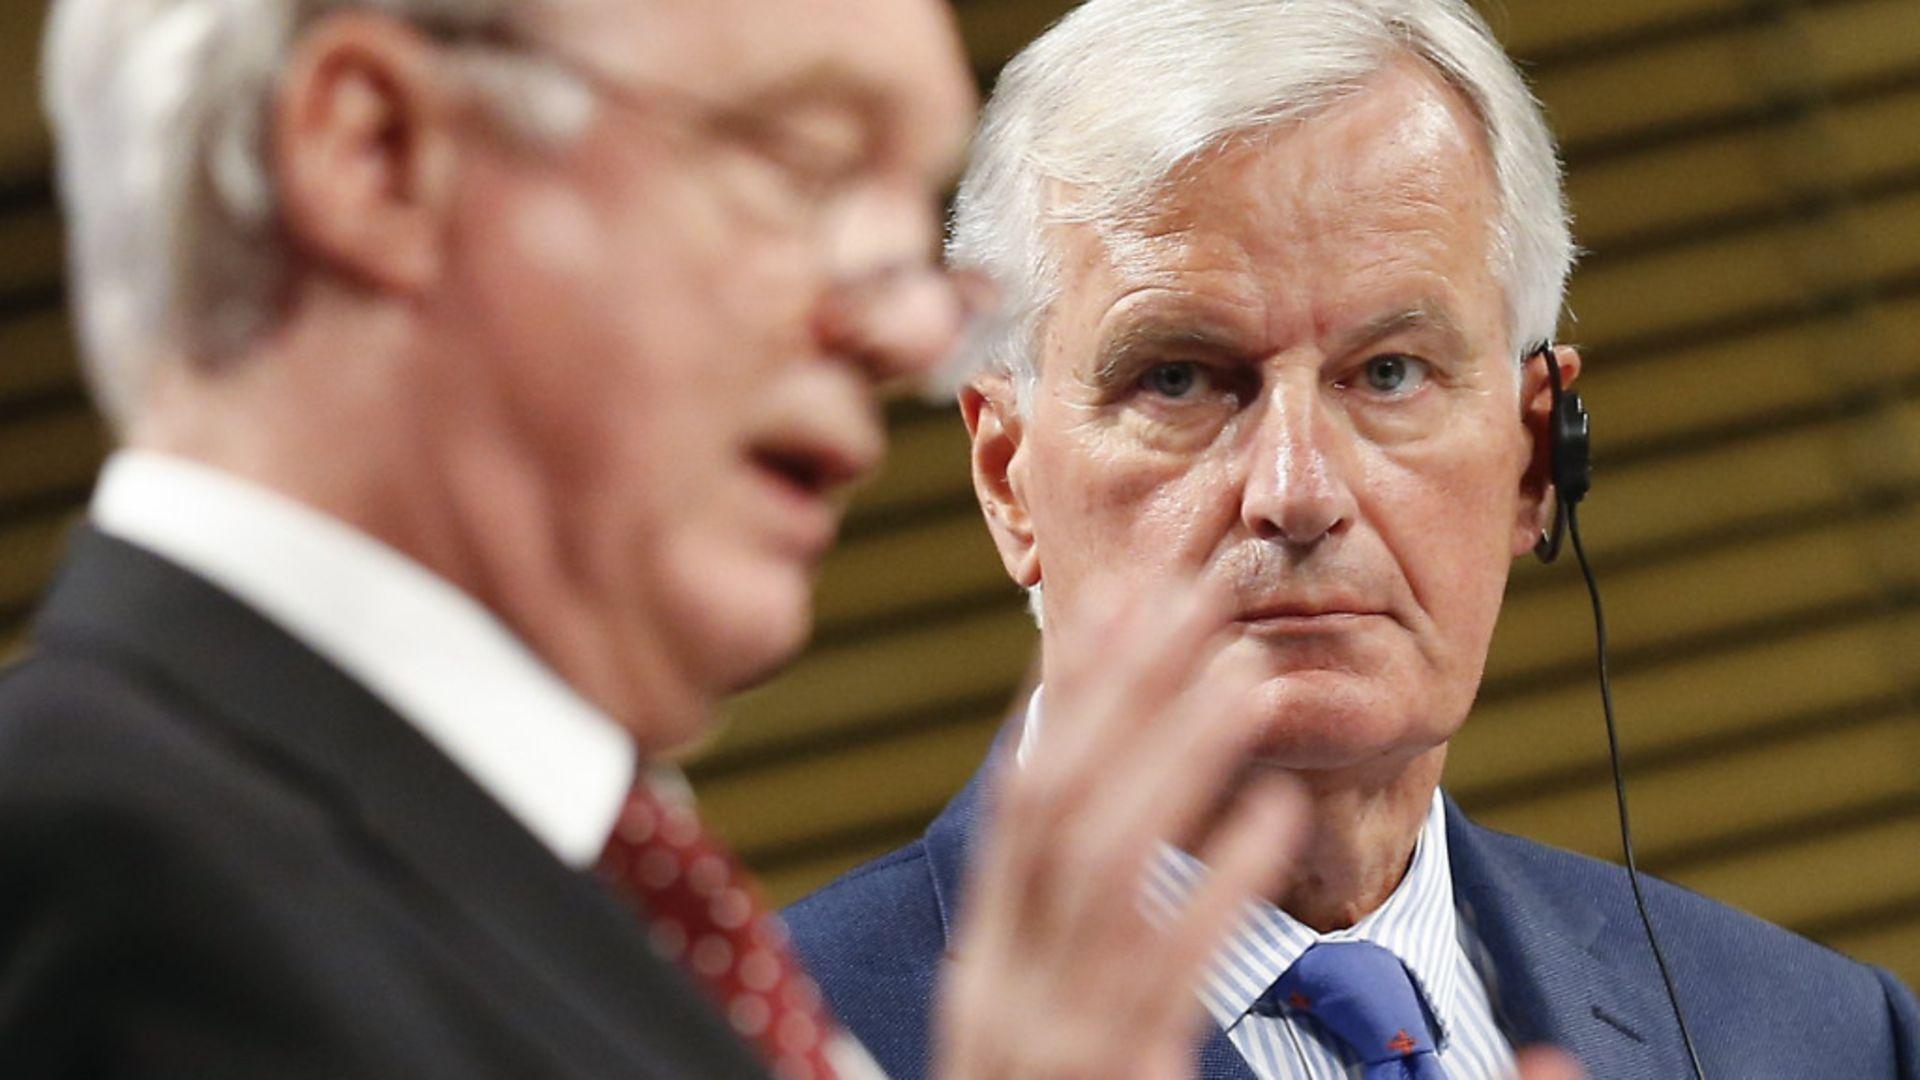 Michel Barnier looks on as former Brexit secretary David Davis speaks in 2017 - Credit: Xinhua News Agency/PA Images